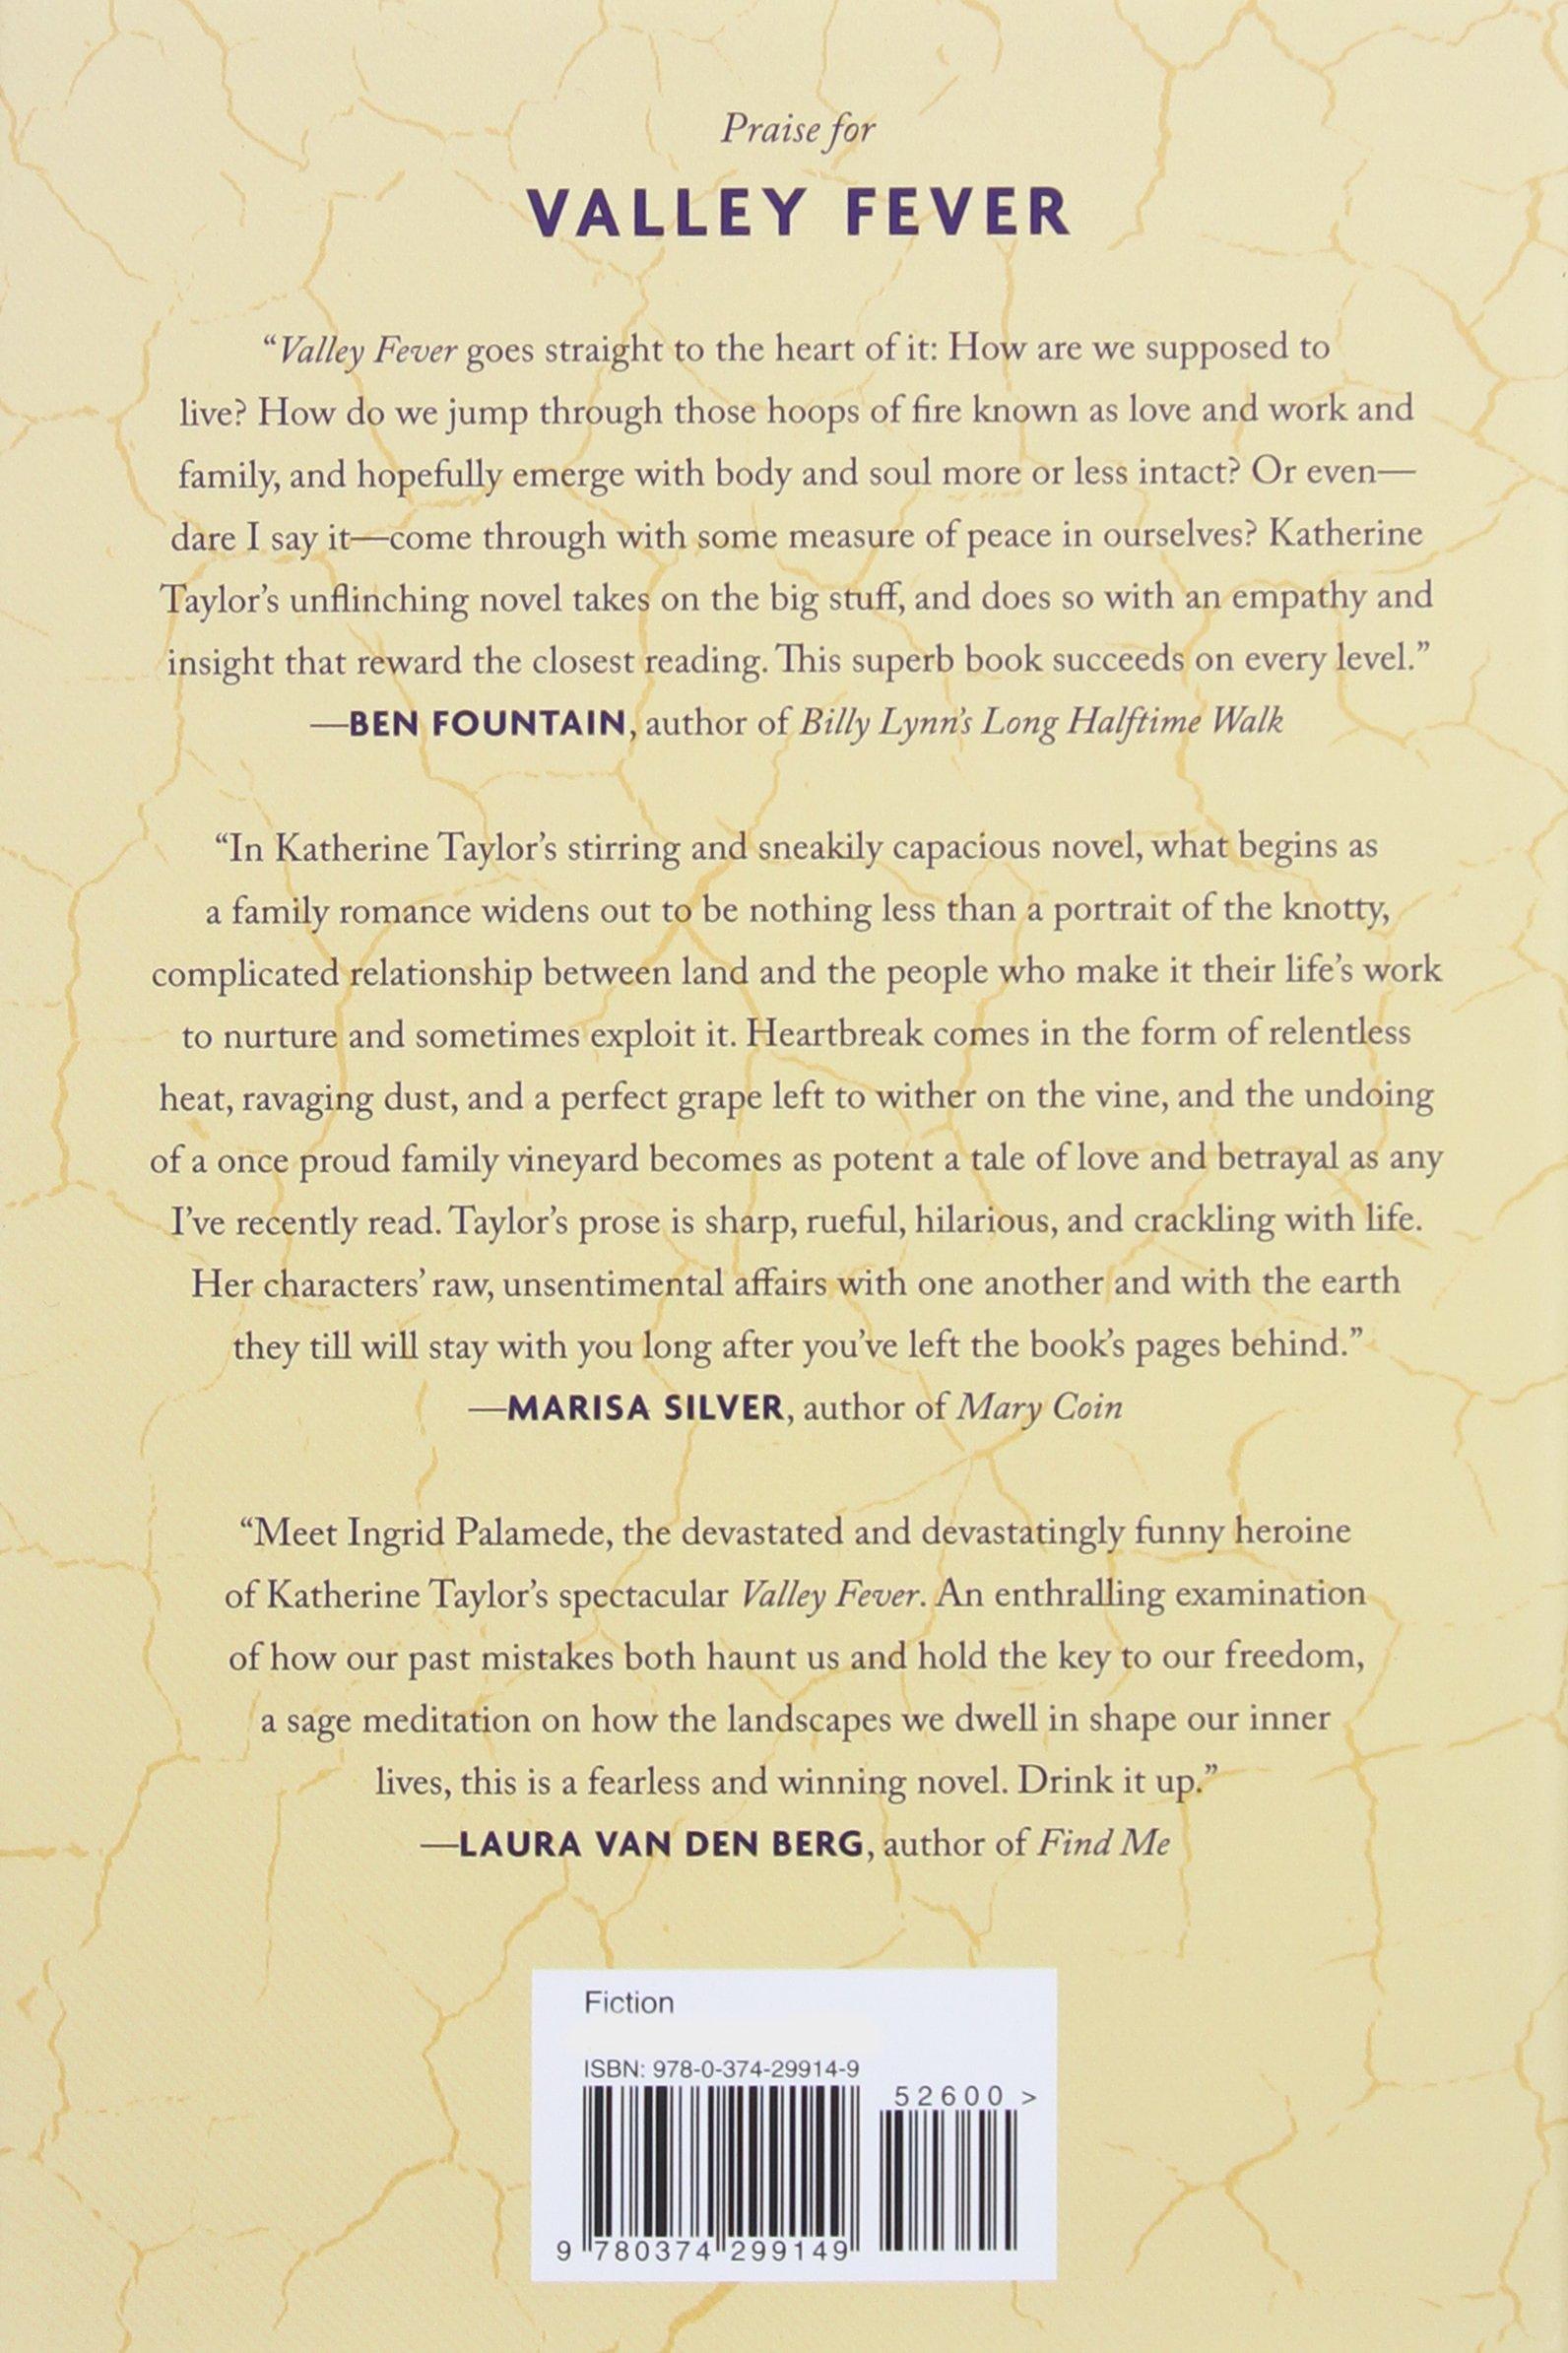 Amazon: Valley Fever: A Novel (9780374299149): Katherine Taylor: Books